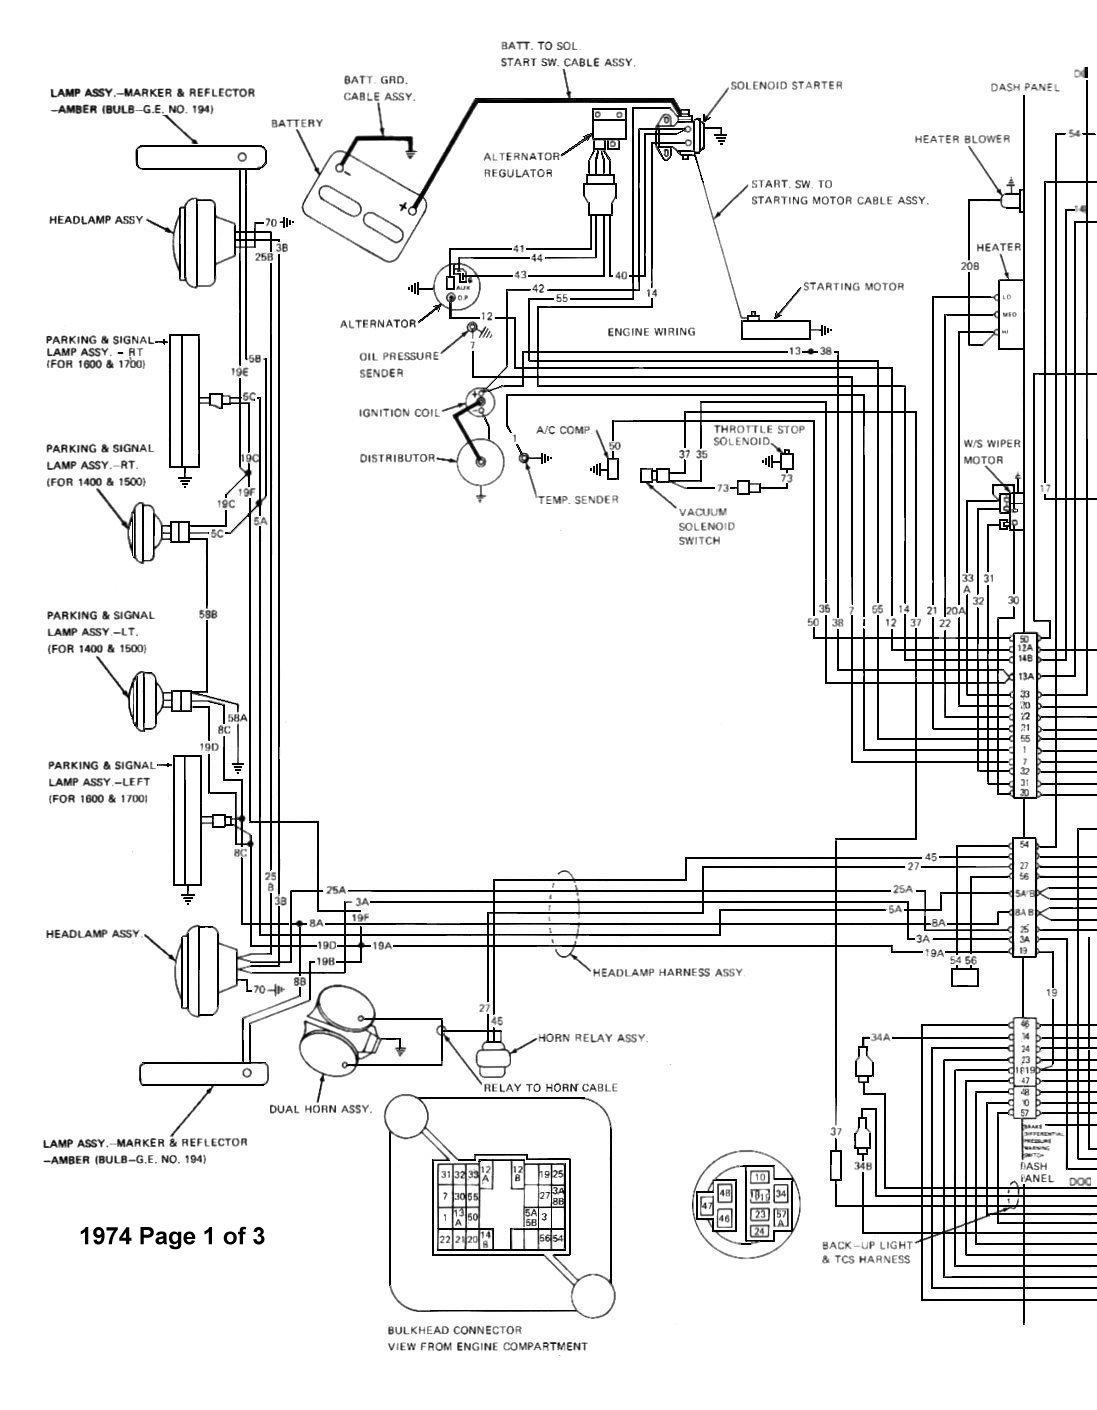 1991 jeep cherokee headlight wiring diagram 1985 peterbilt 359 grand wagoneer search for diagrams